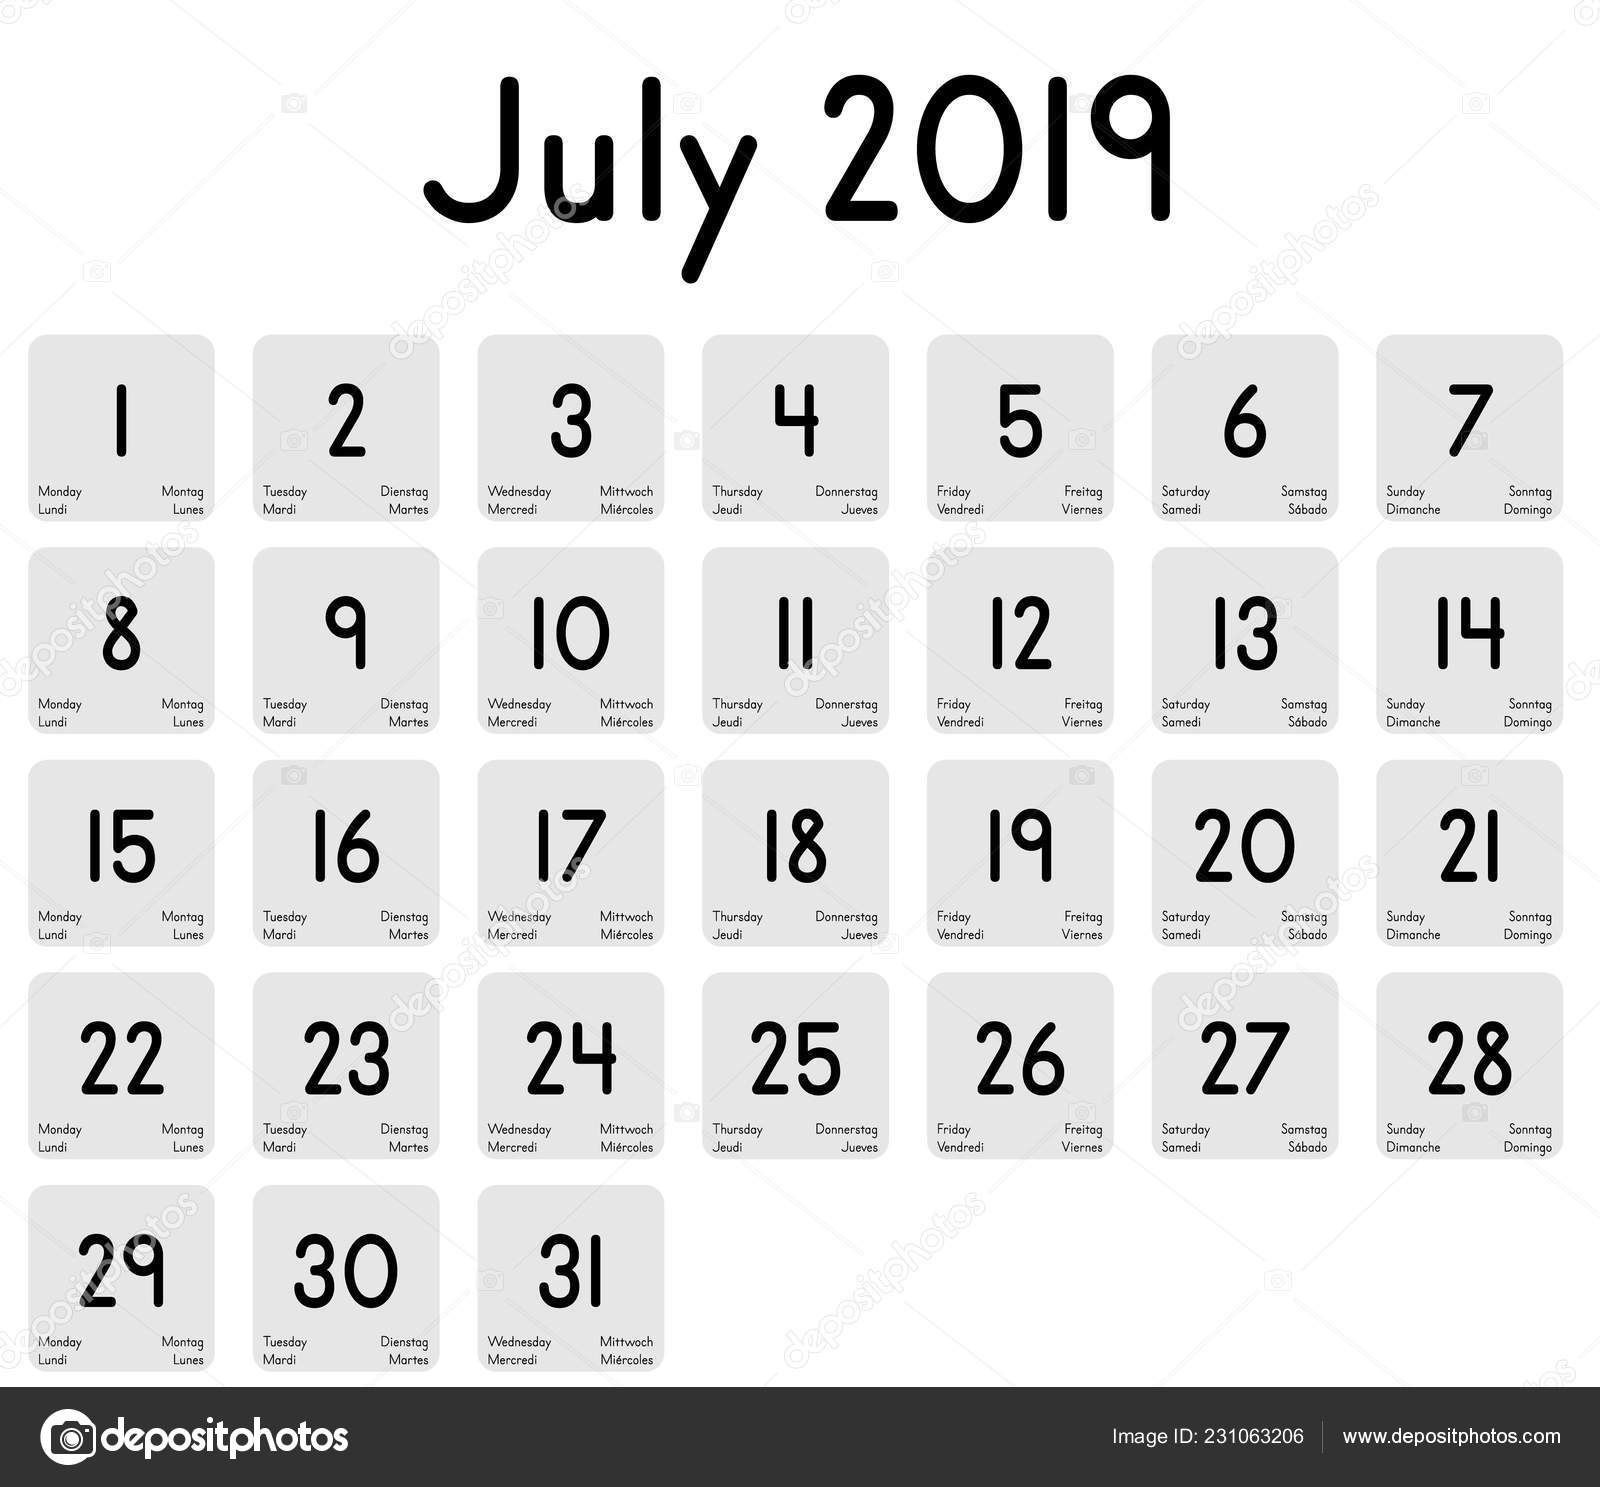 Calendario Mes De Julio.Detallado Calendario Diario Del Mes Julio 2019 Vector De Stock